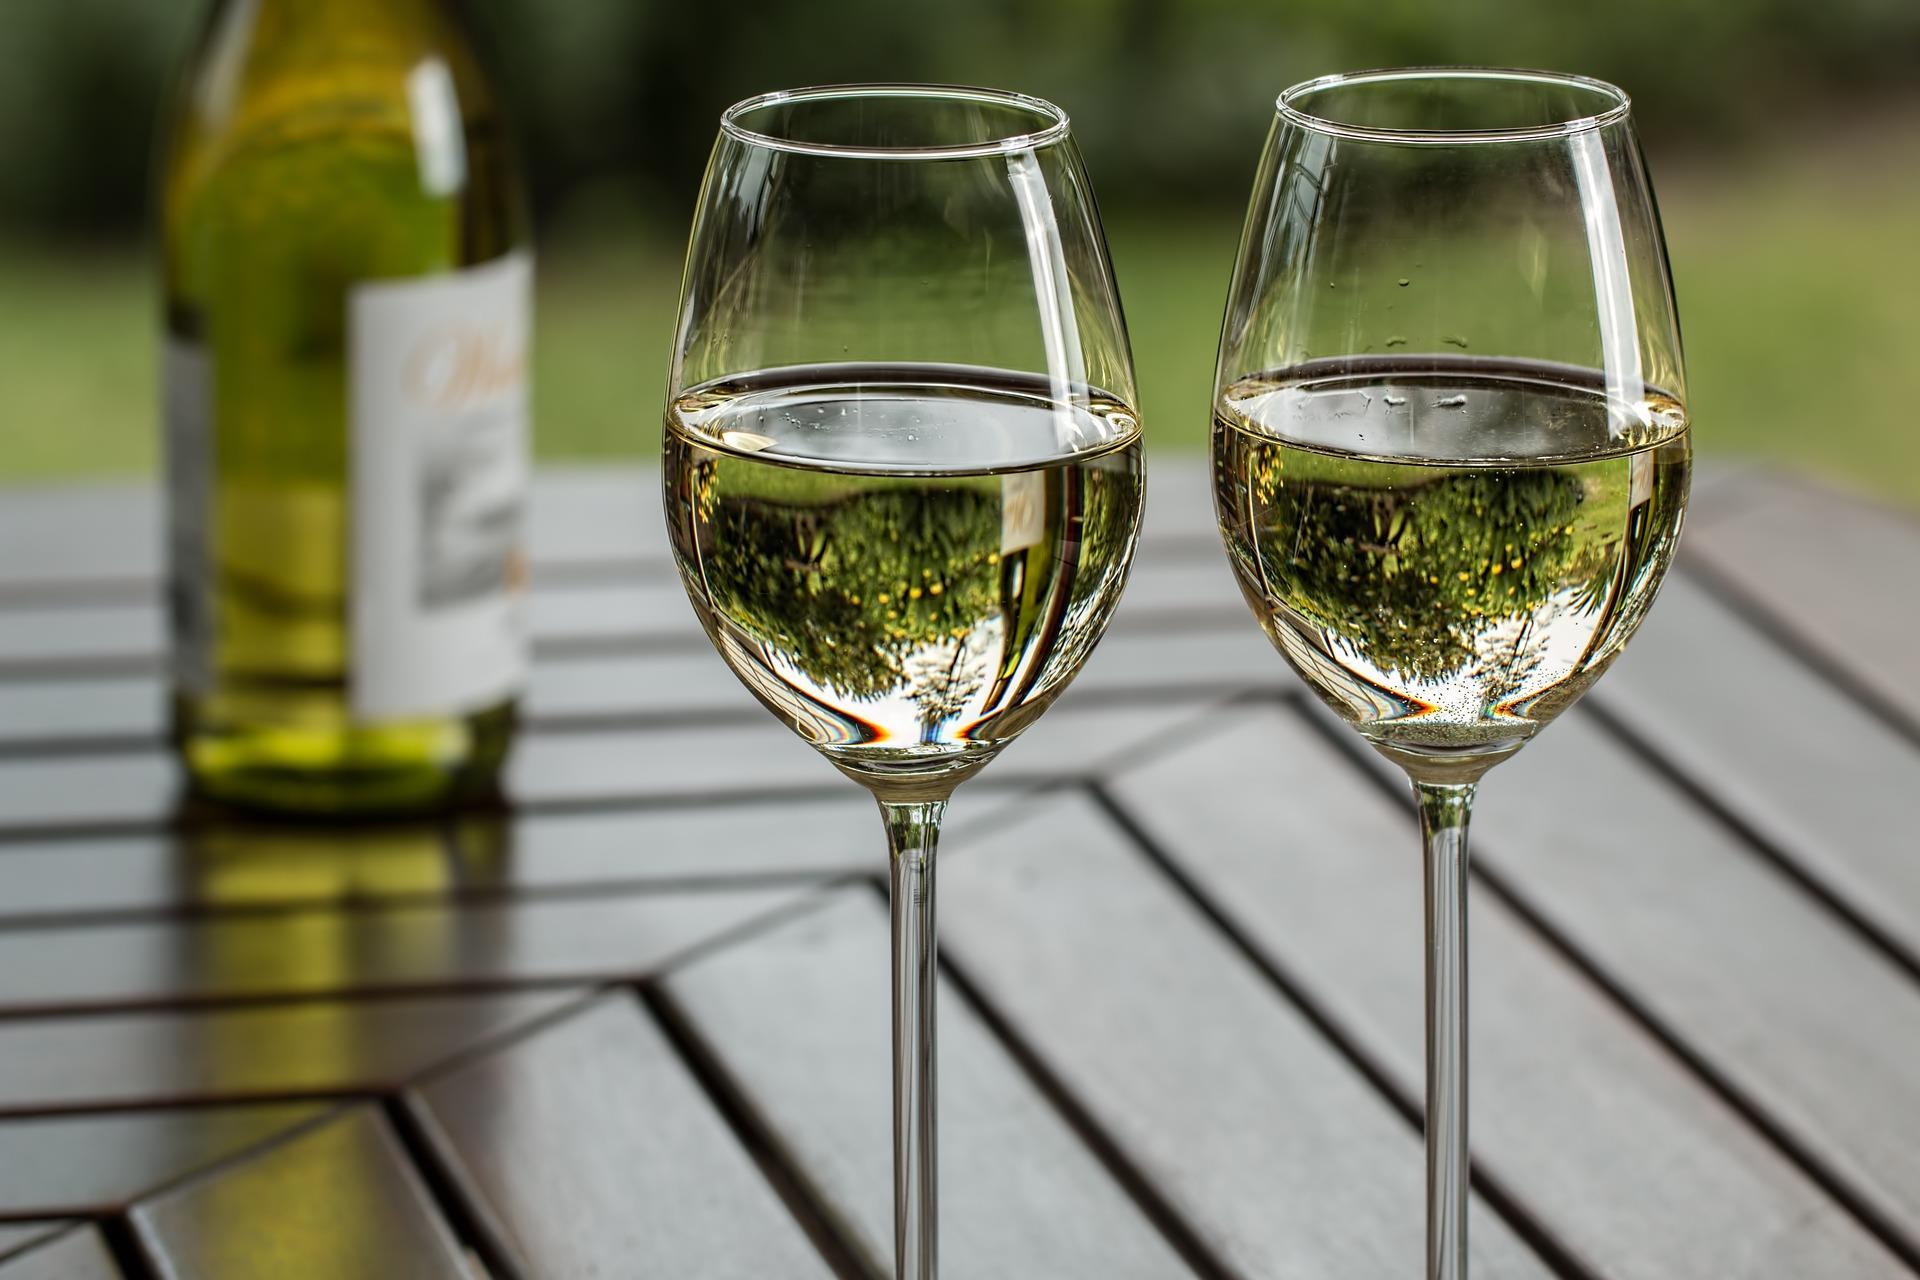 Schorr Lake Vineyards & Winery